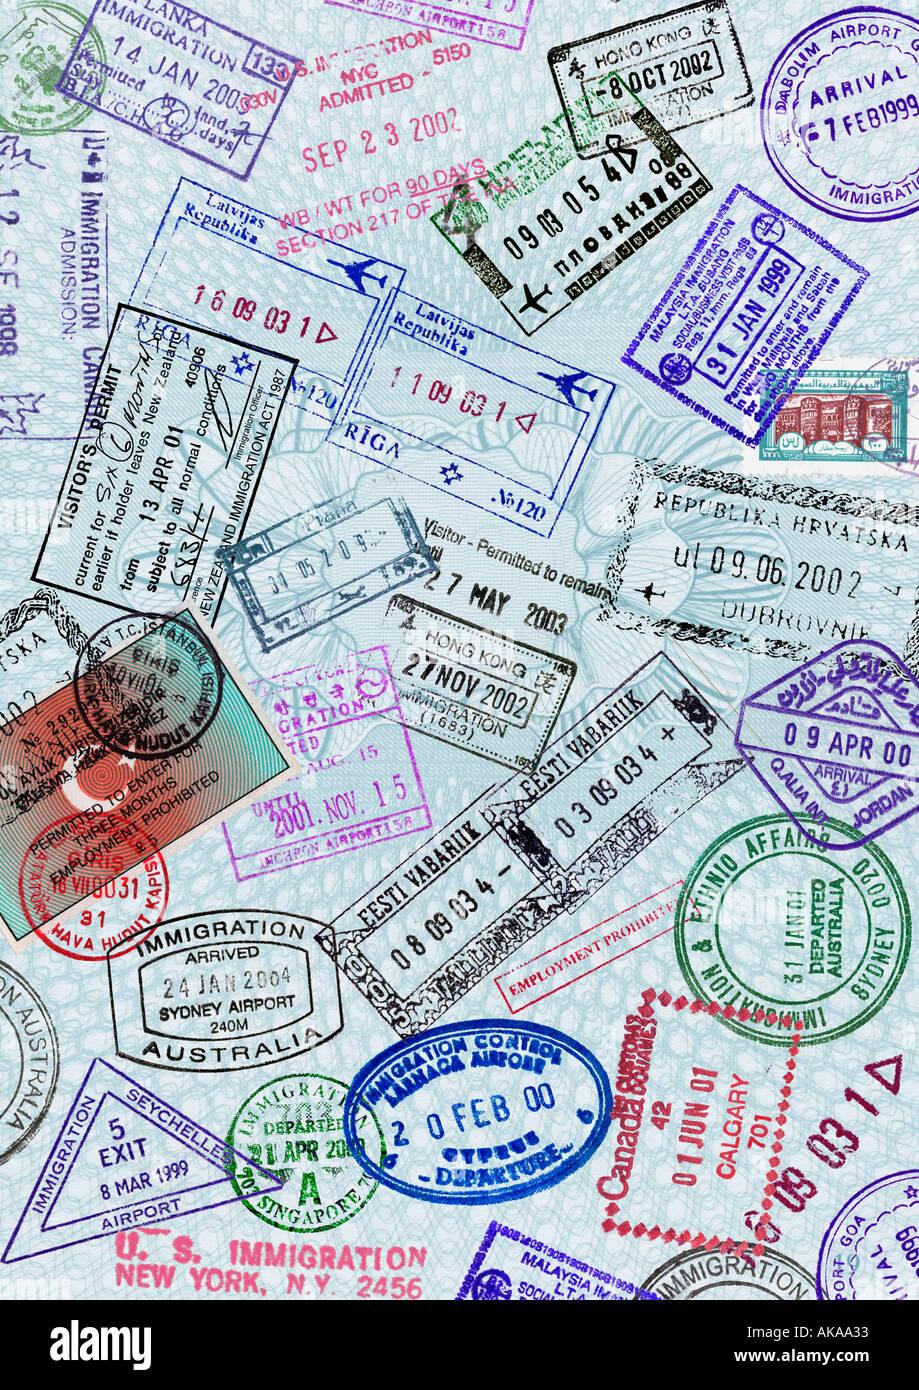 Passport Page Travel Immigration Visa Stamp Montage